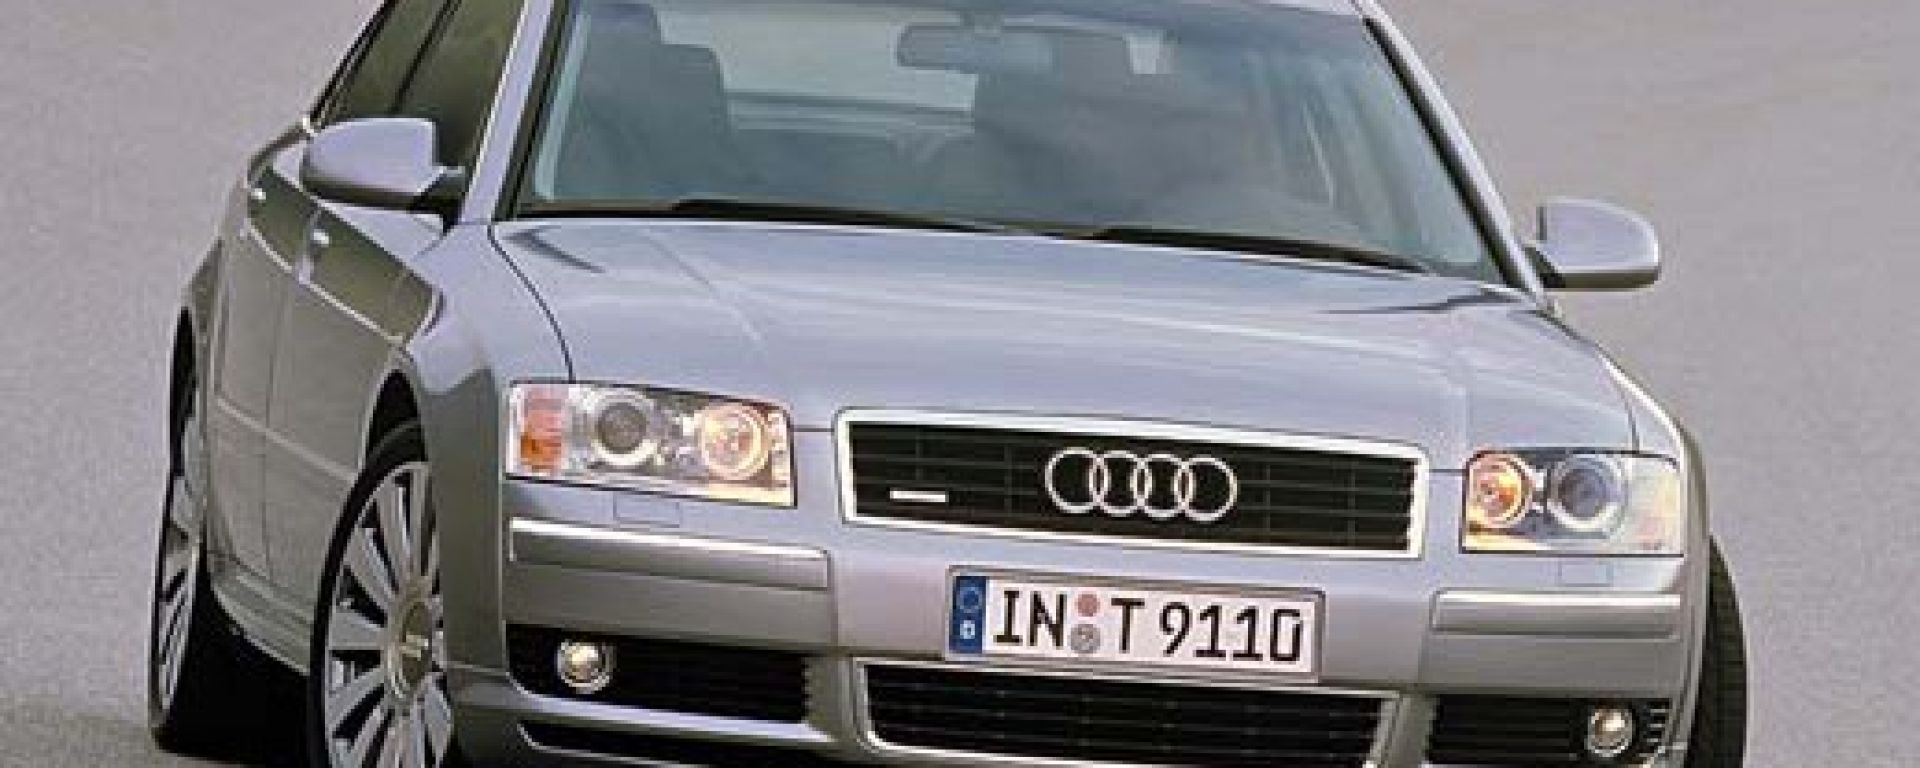 Audi A8 my 2002